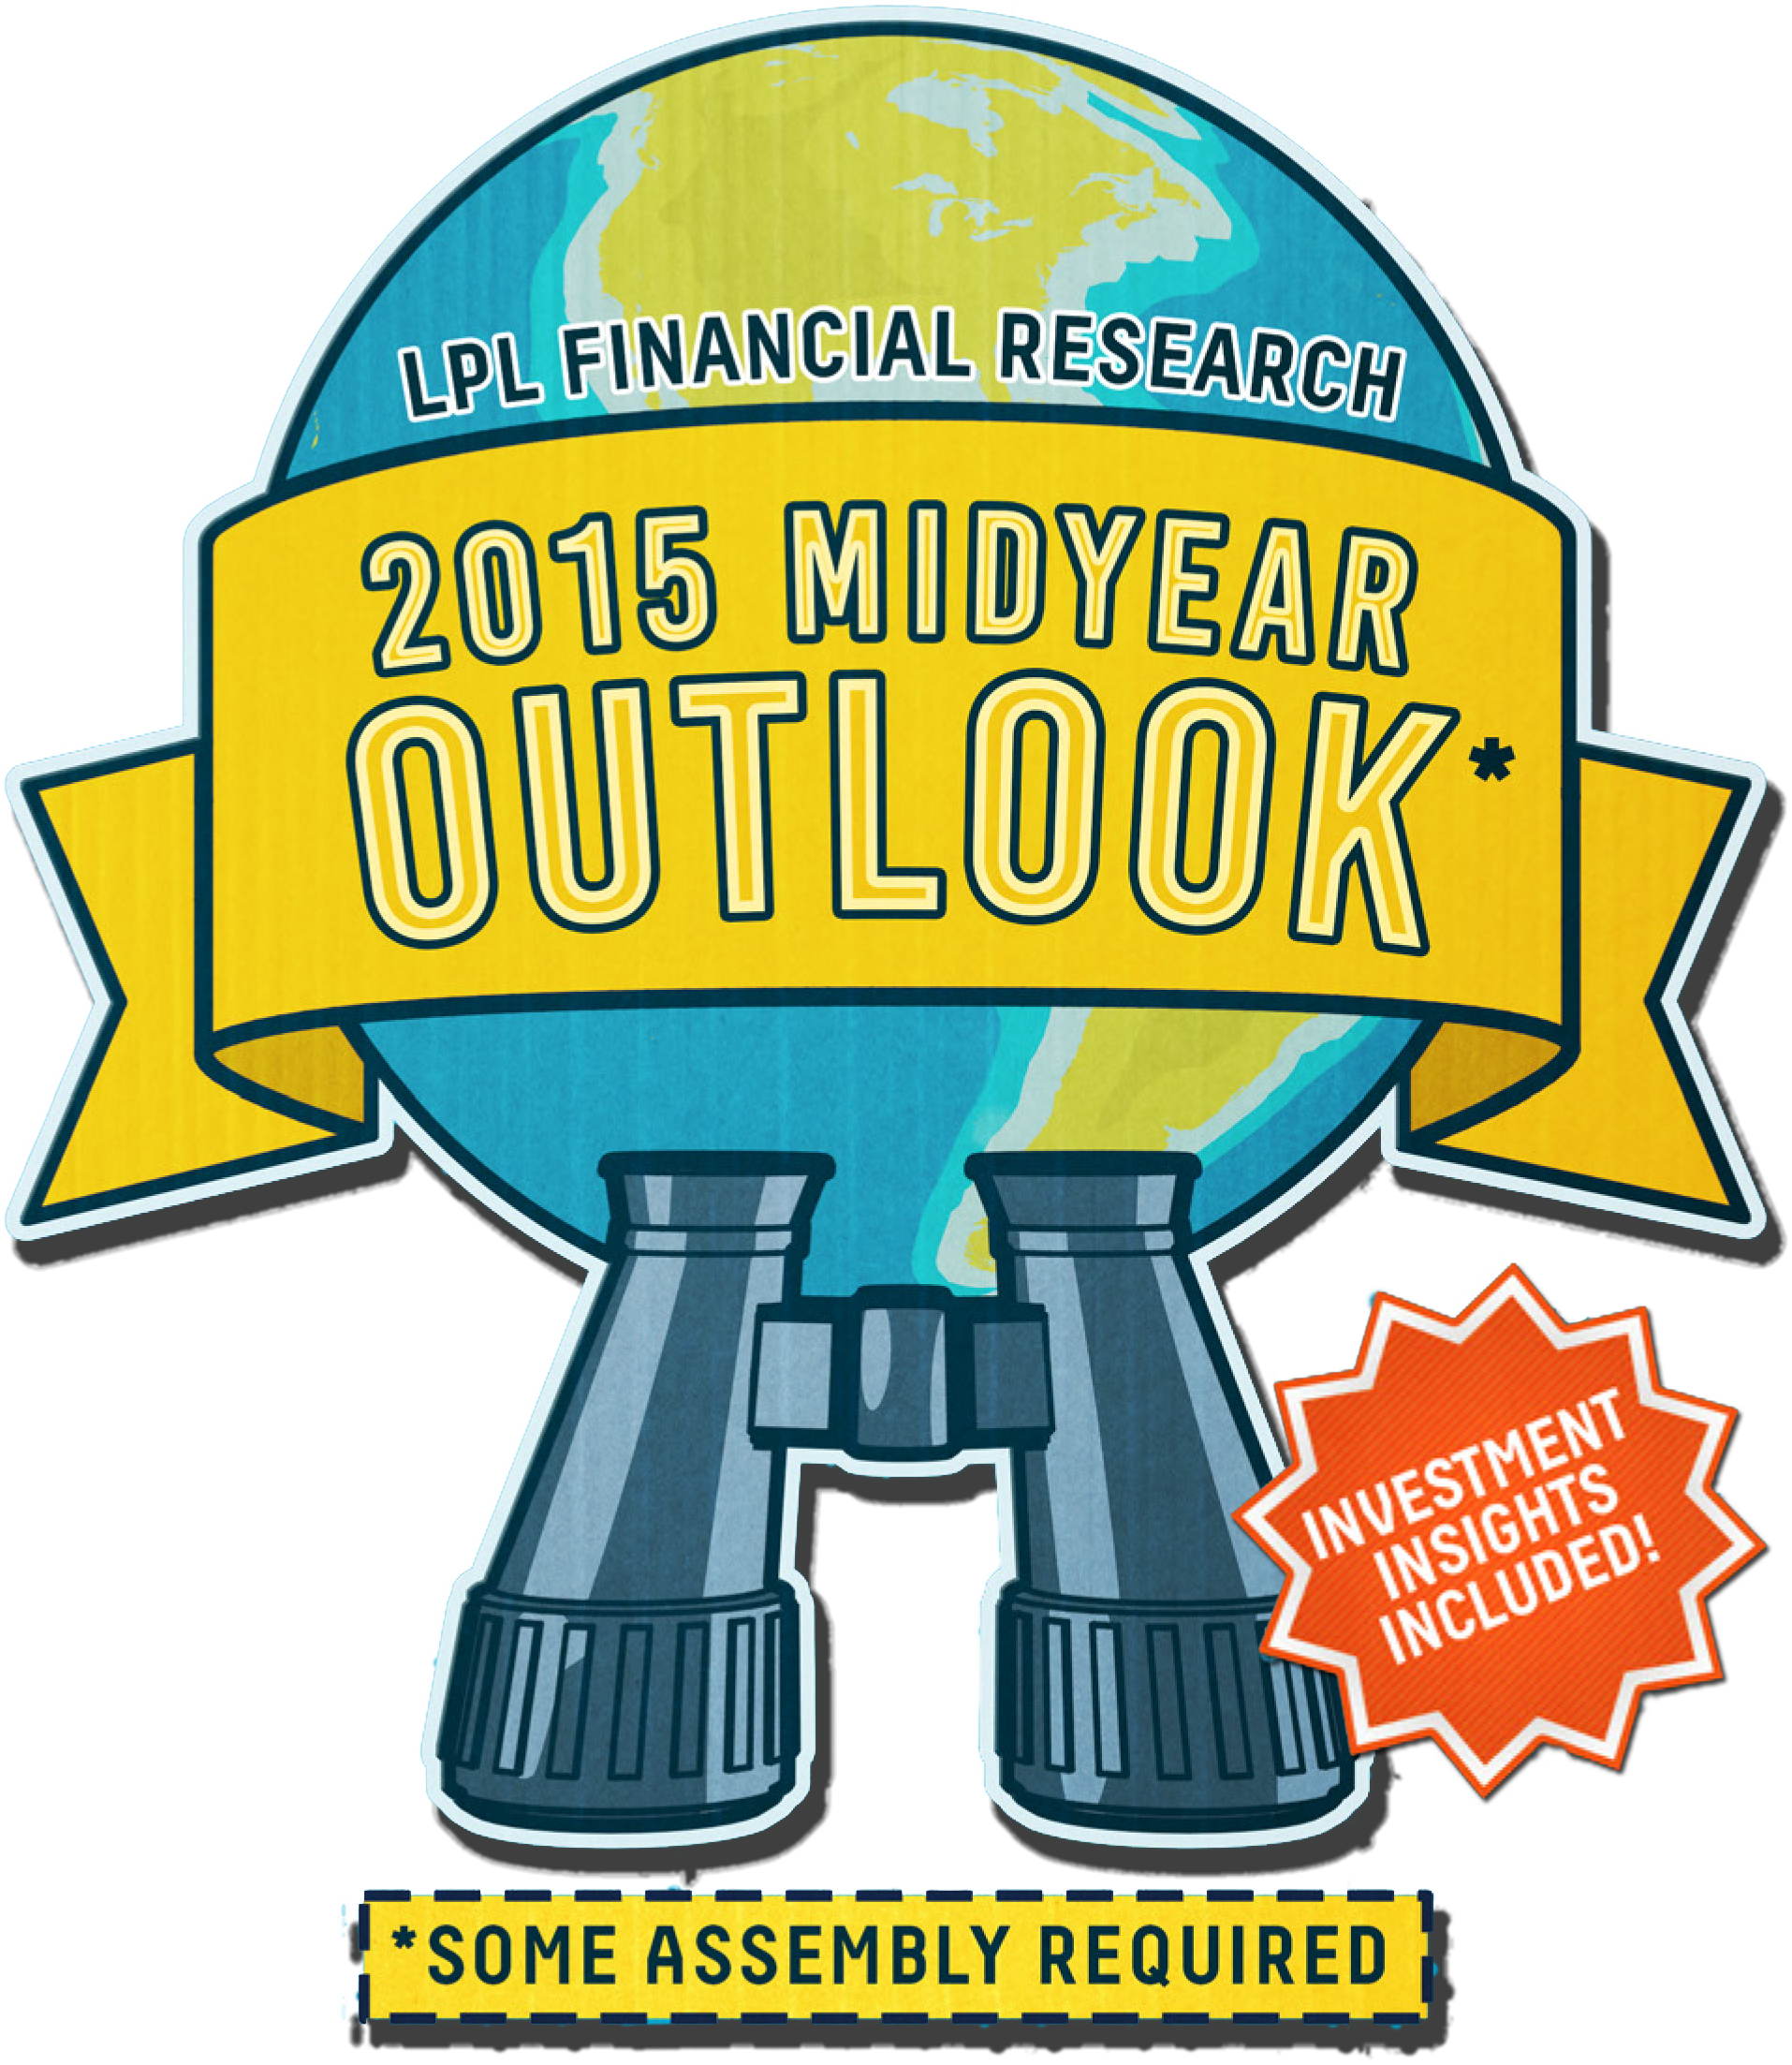 Finance clipart marketing. Tennessee valley asset management